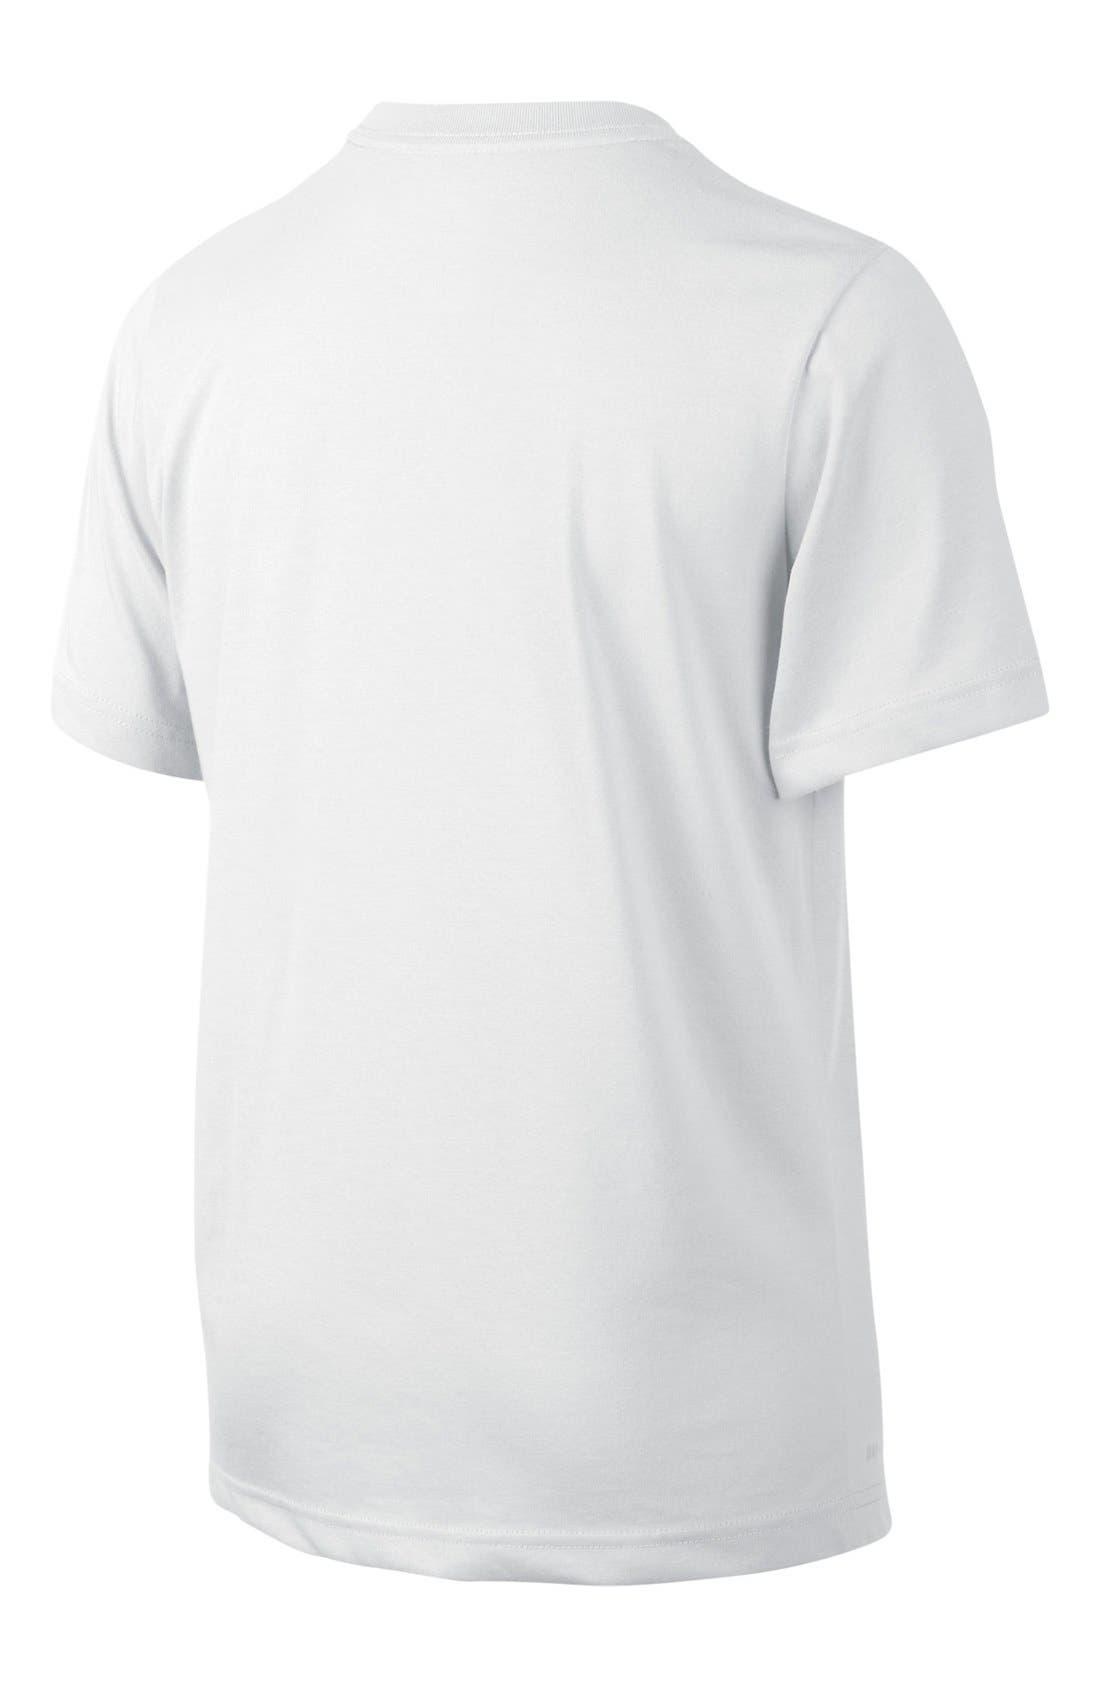 Alternate Image 2  - Nike 'Opposing Forces' T-Shirt (Big Boys)